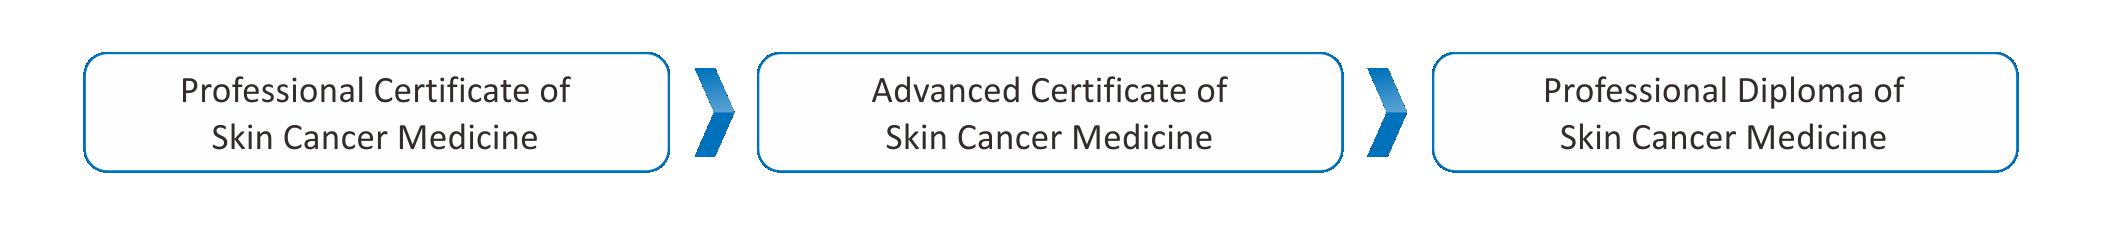 Skin Cancer Medicine Course Pathway